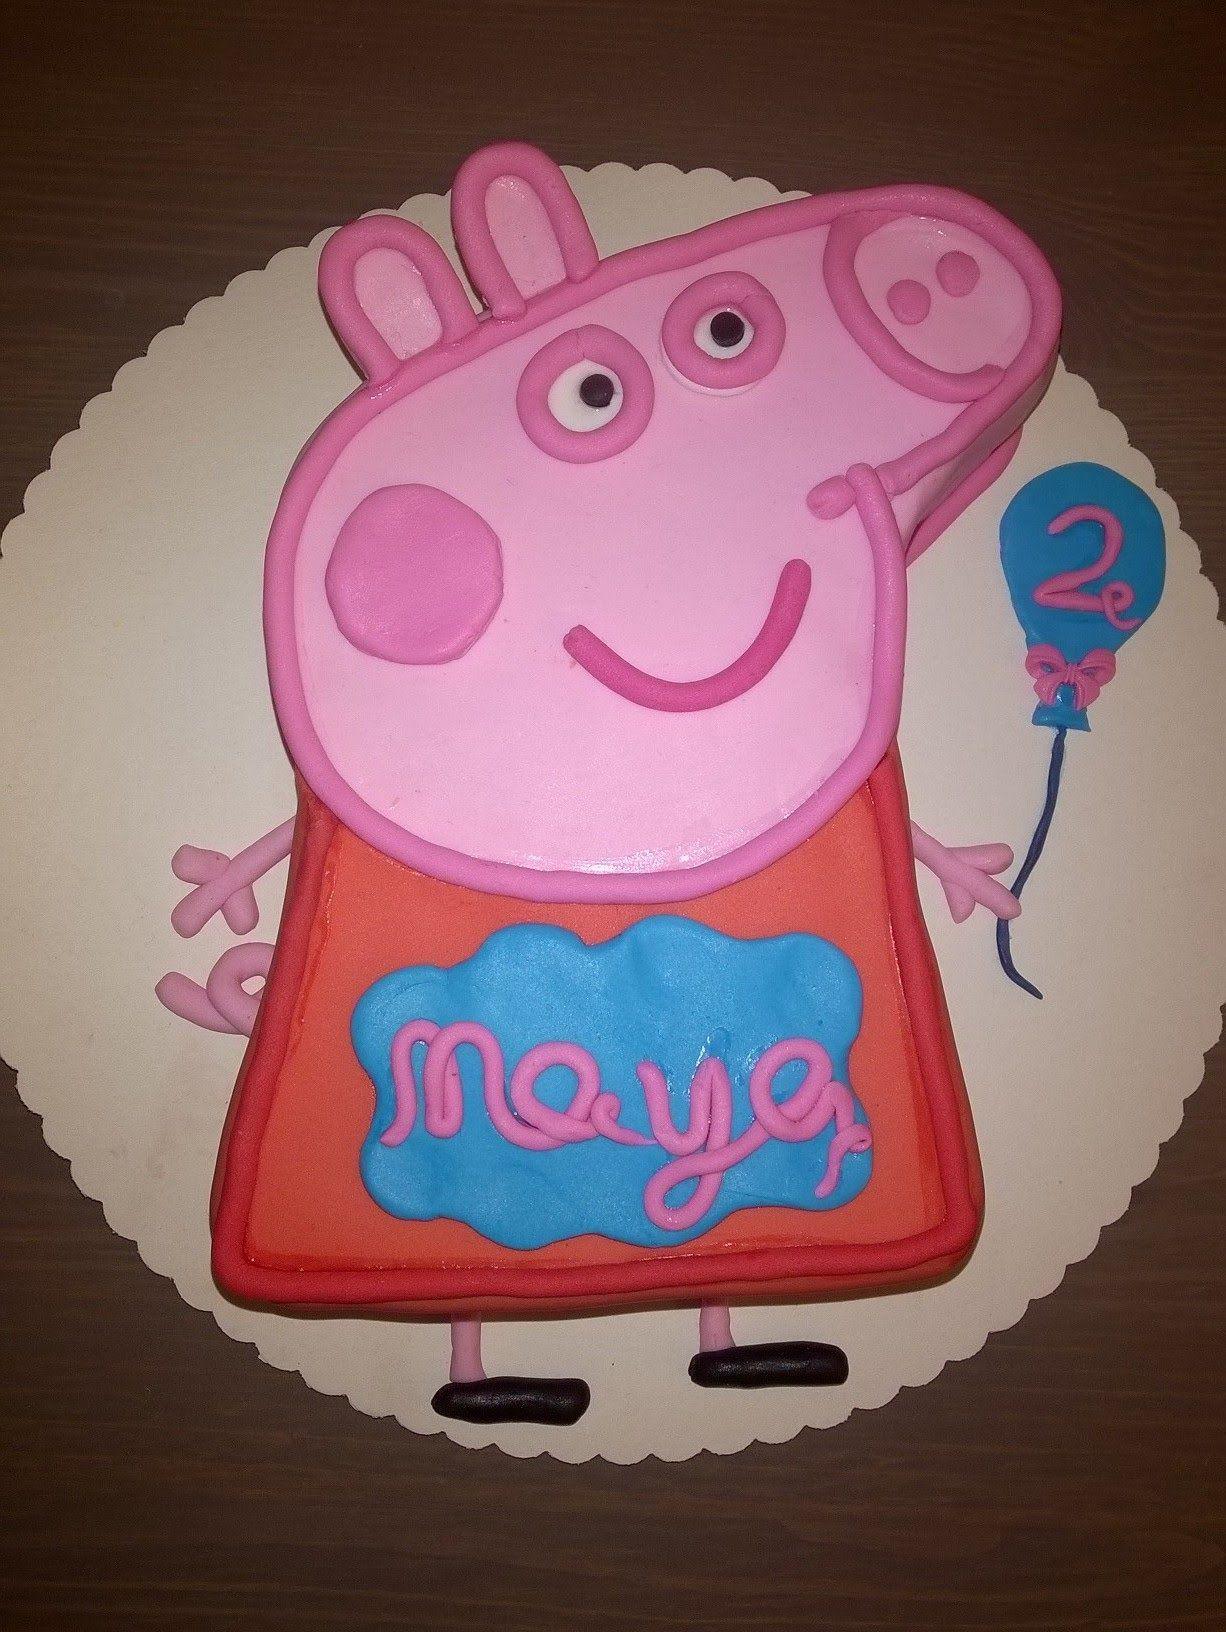 05 Peppa Pig Peppa Wutz Geburtstagstorte Cake Tutorial Buttercreme F Peppa Schwein Kuchen Peppa Wutz Torte Peppa Wutz Kuchen